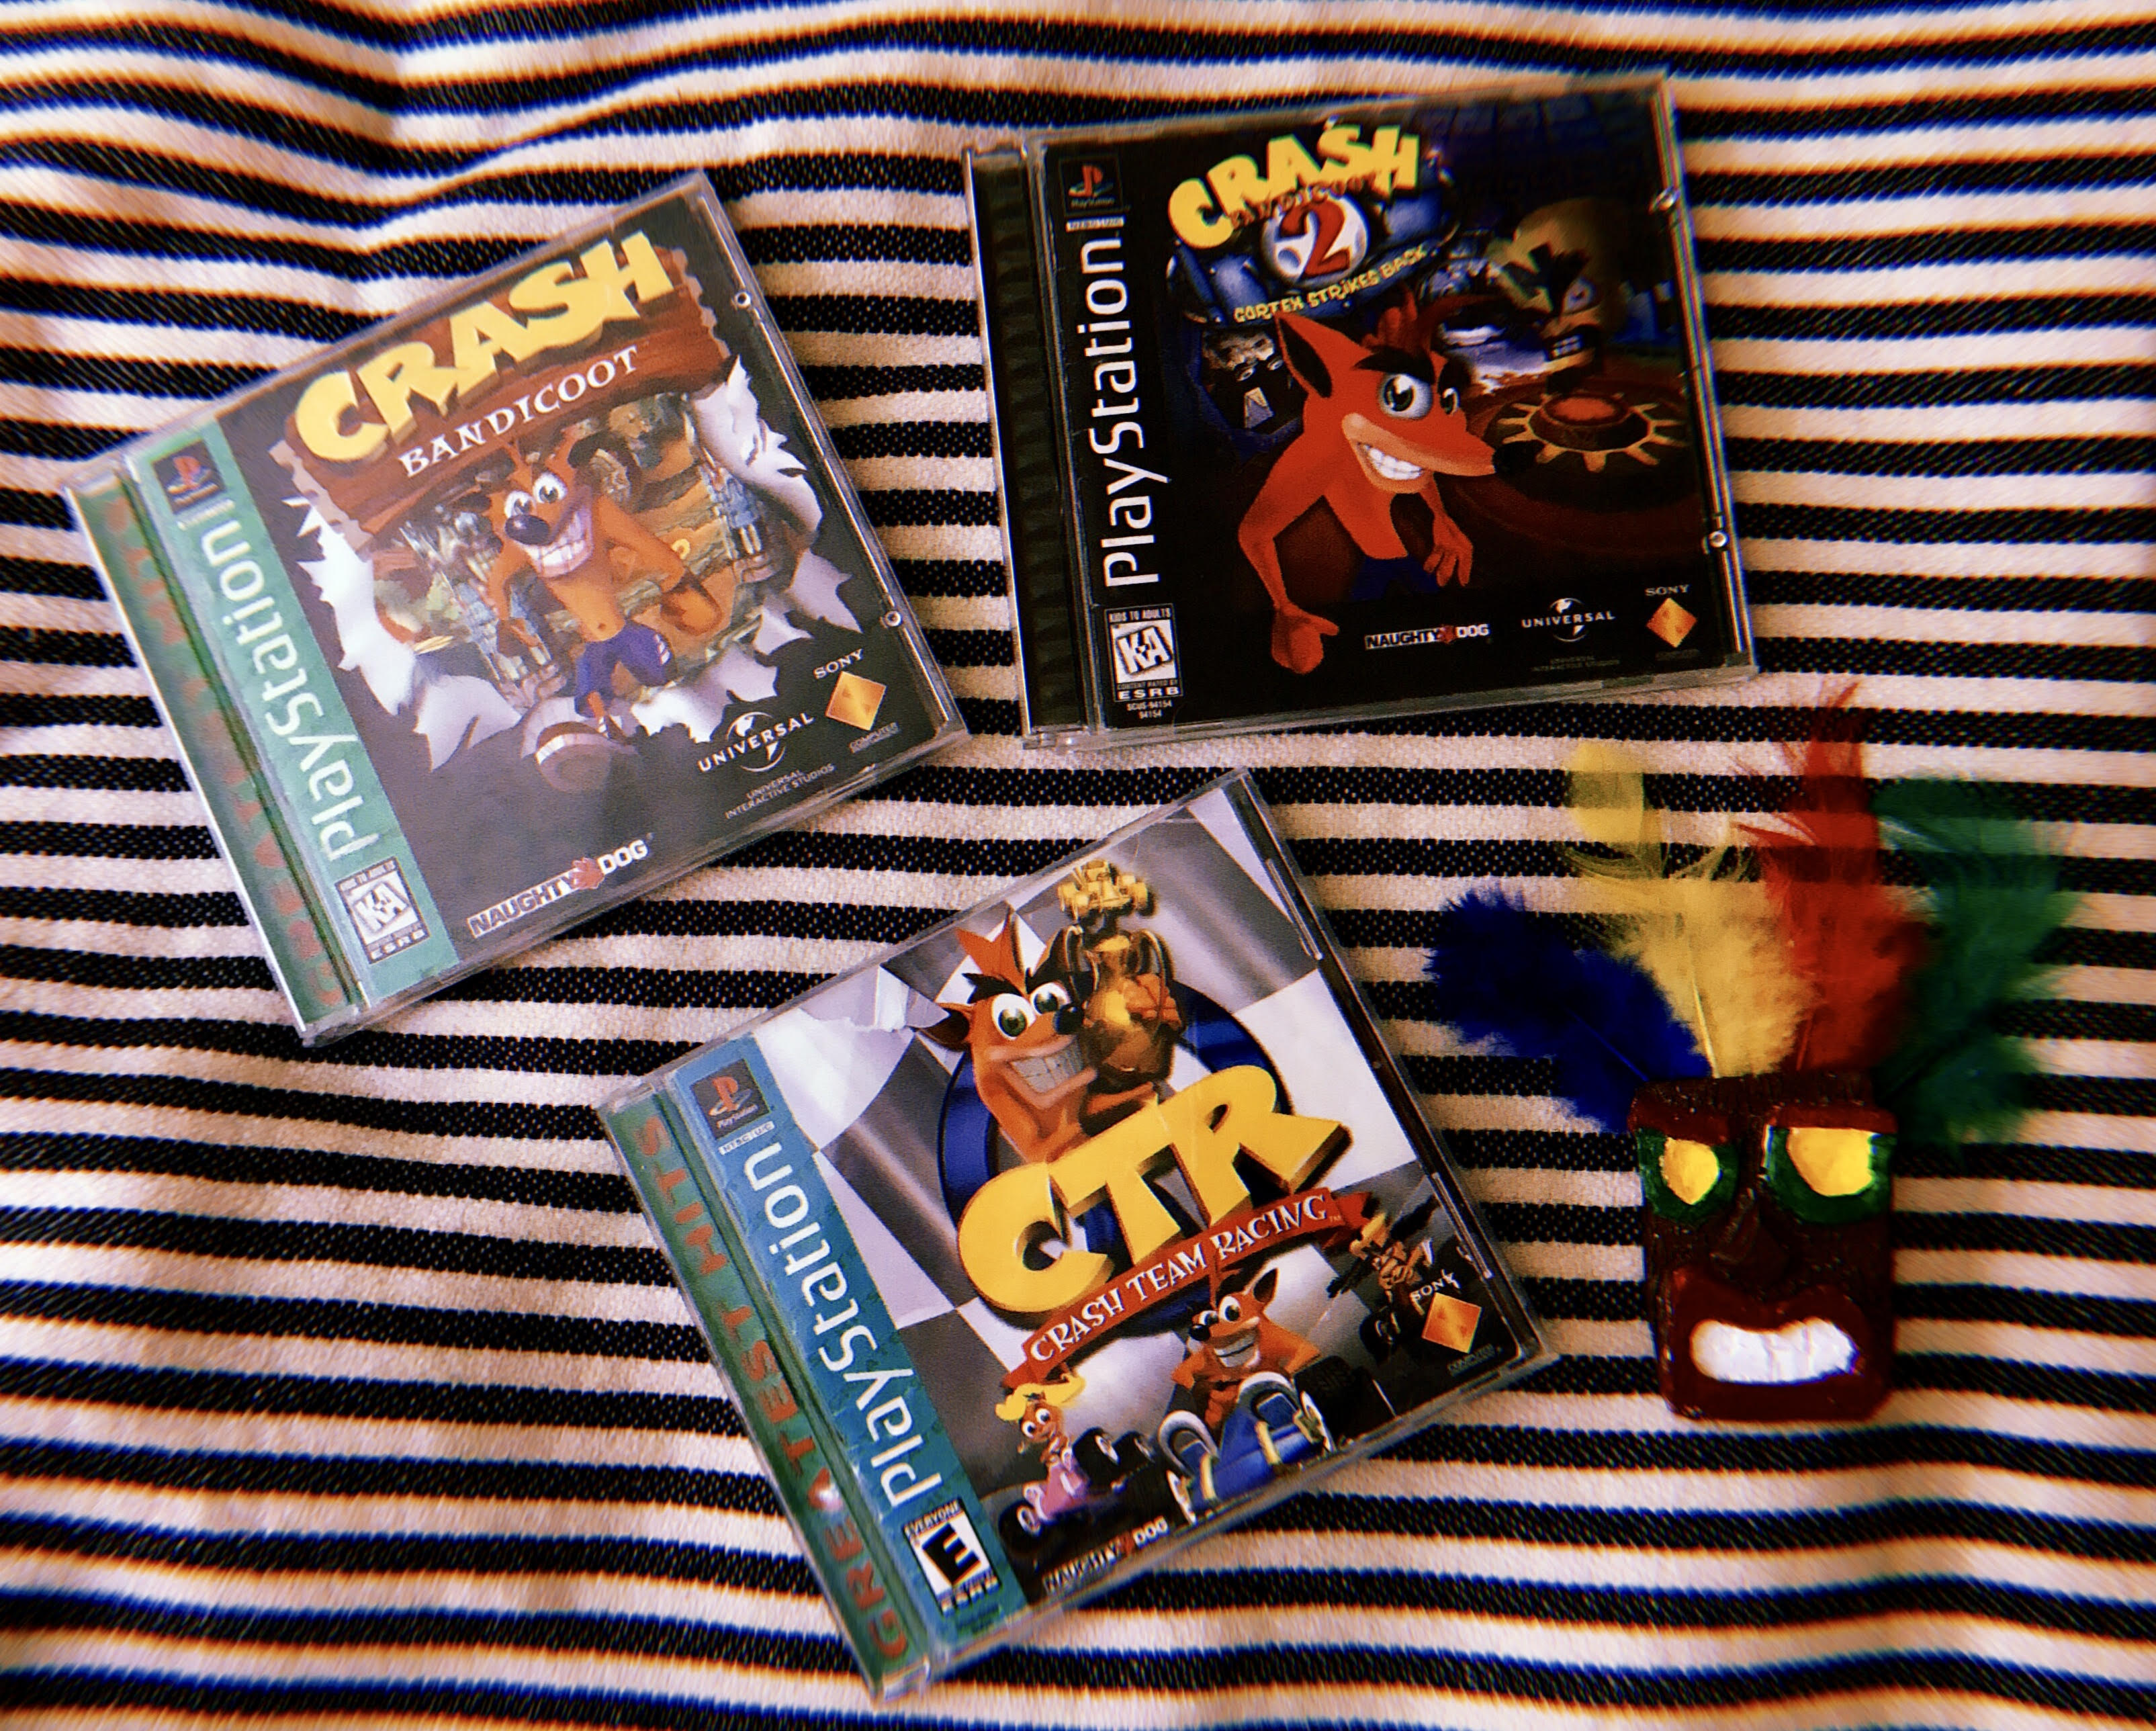 Crash Bandicoot, Cortex Strikes Back and Crash Team Racing.